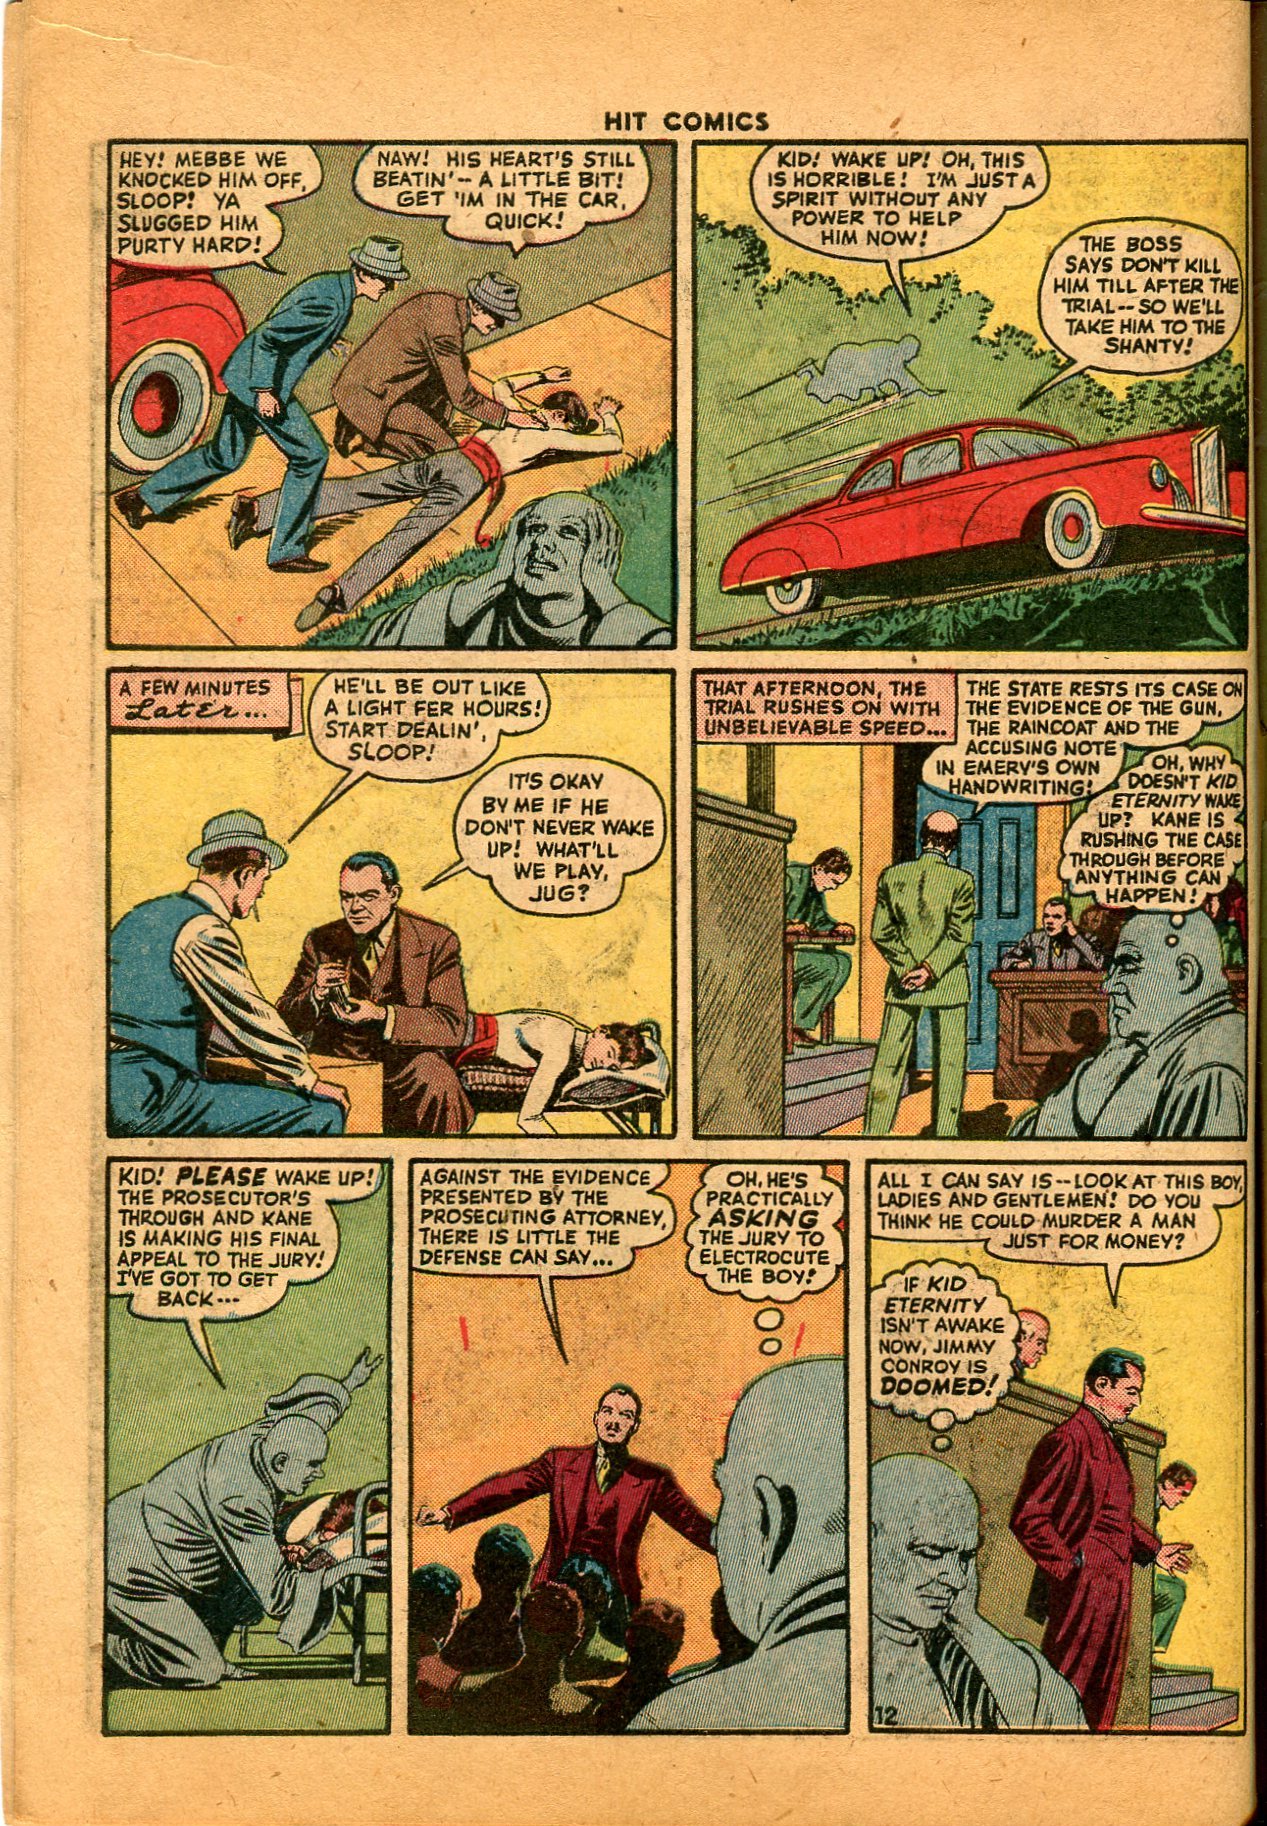 Read online Hit Comics comic -  Issue #35 - 14